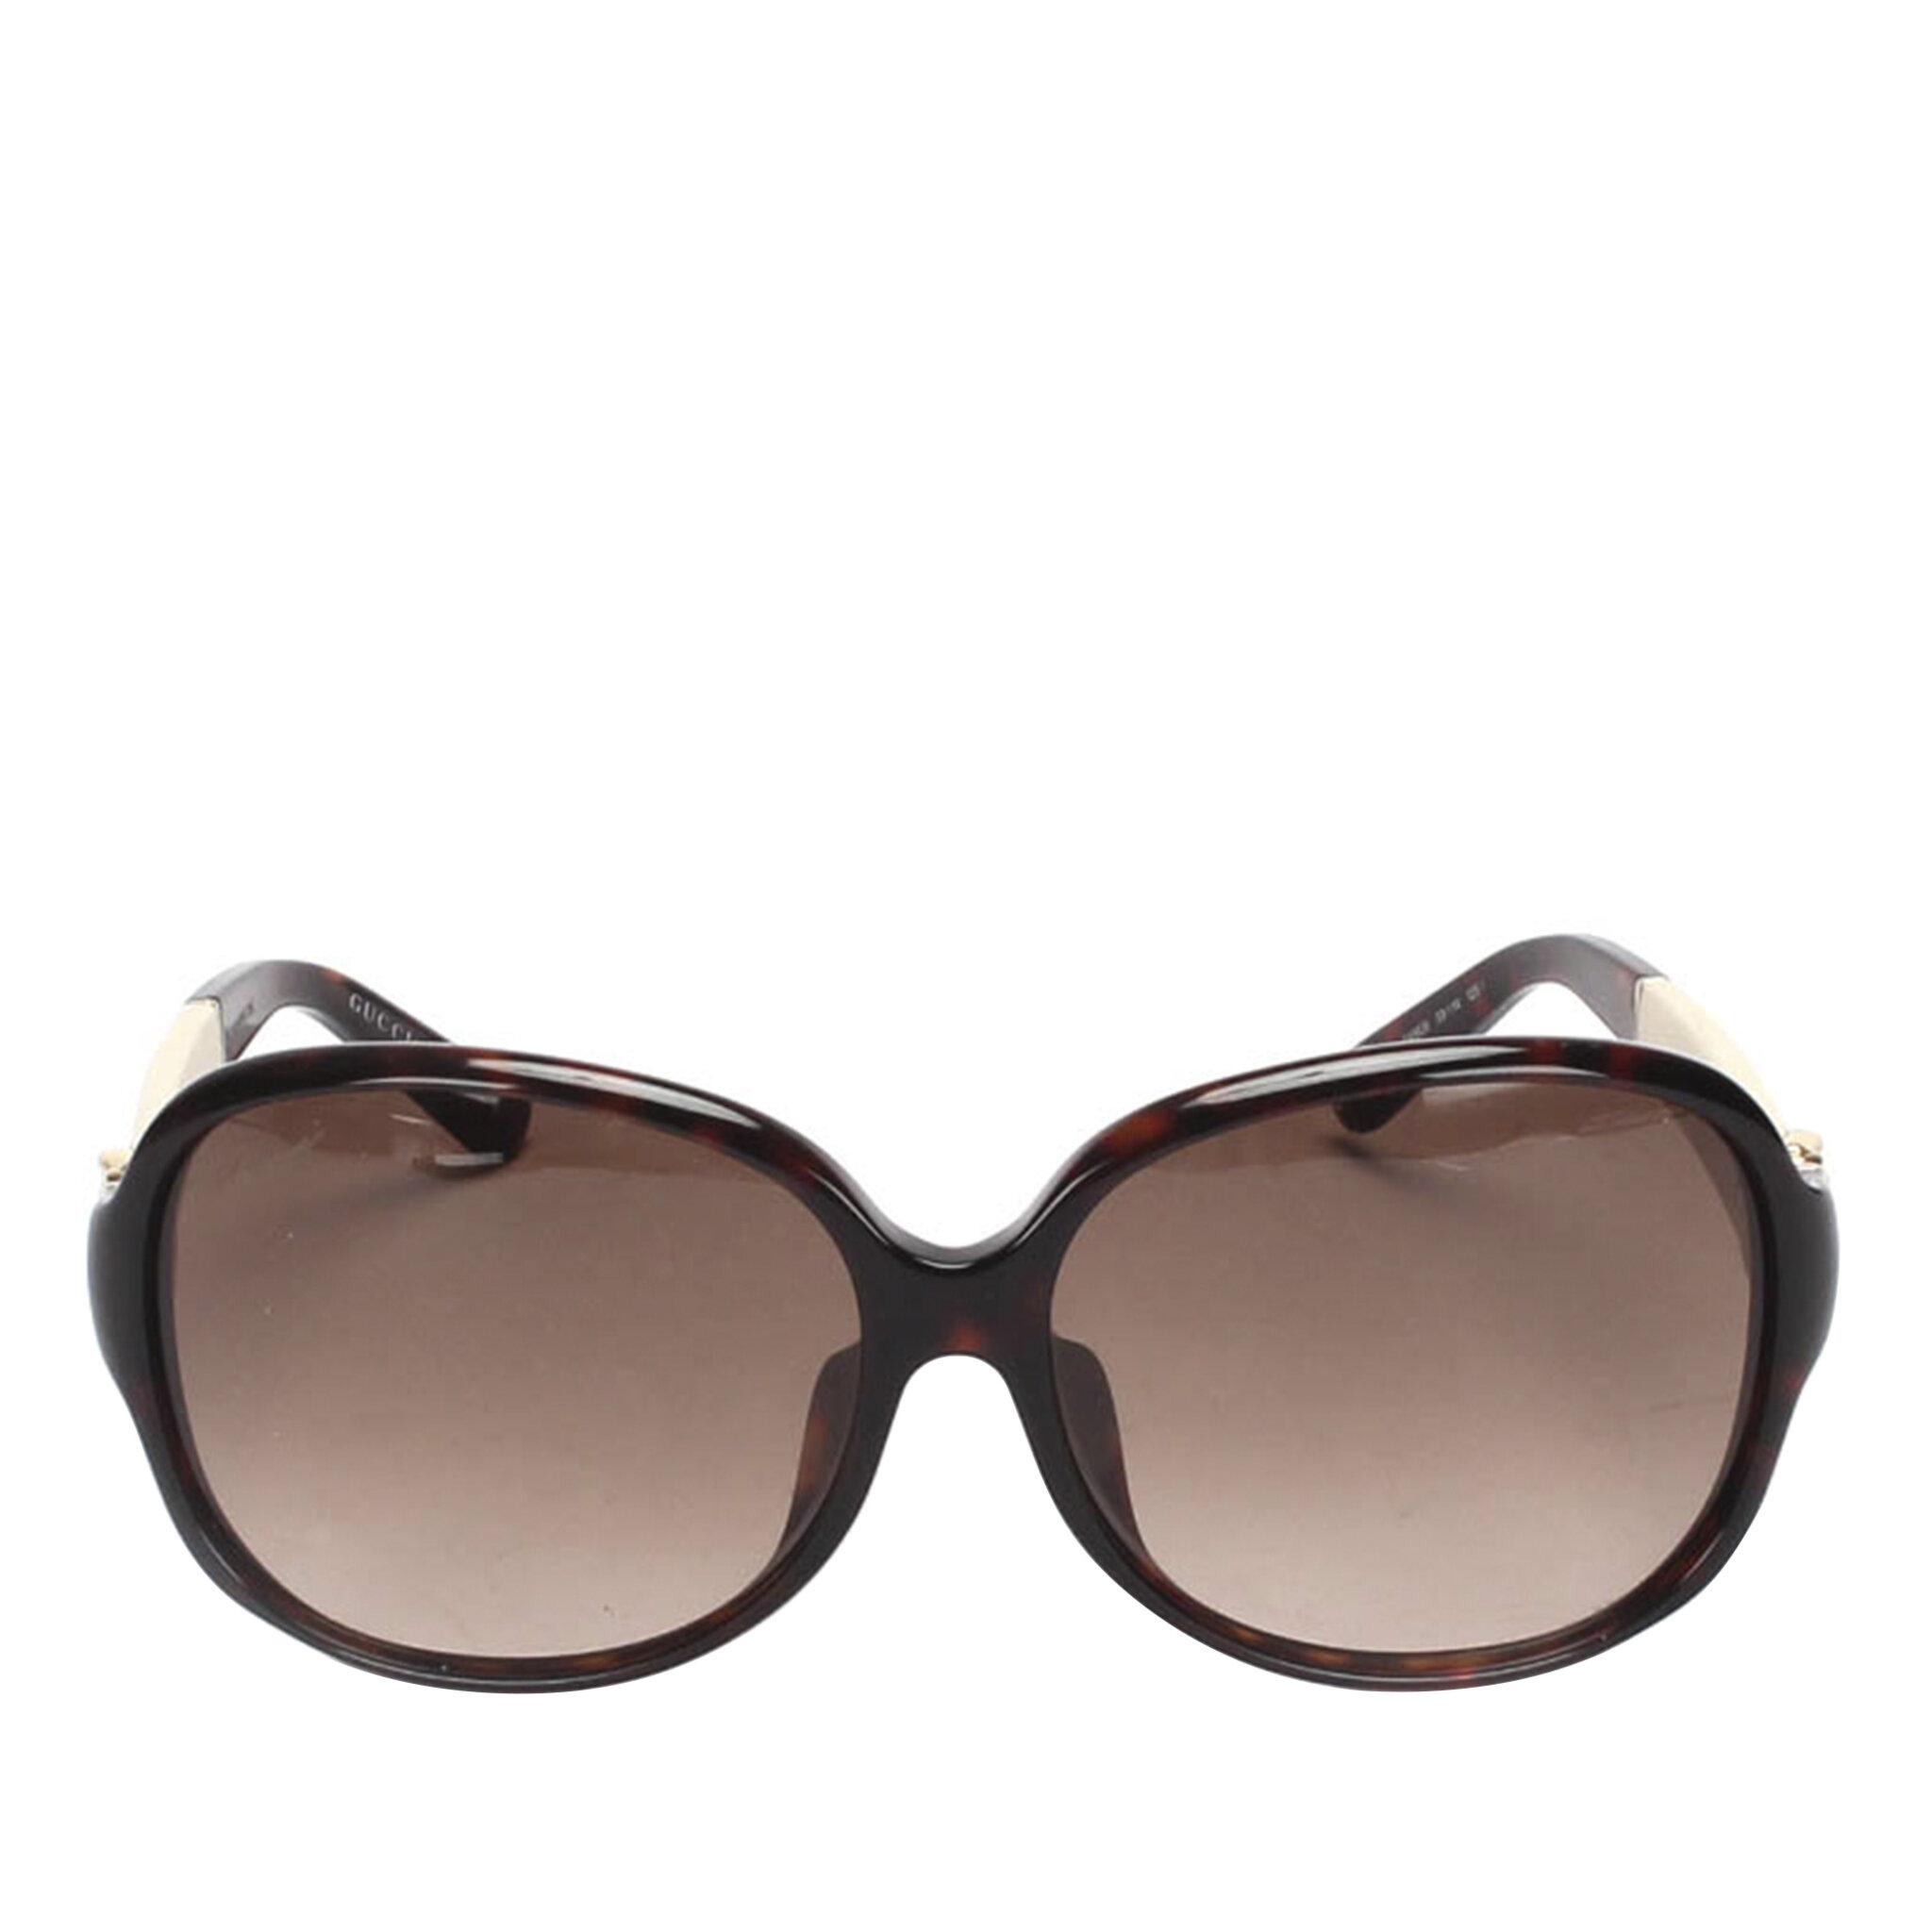 Gucci Round Tinted Sunglasses, ONESIZE